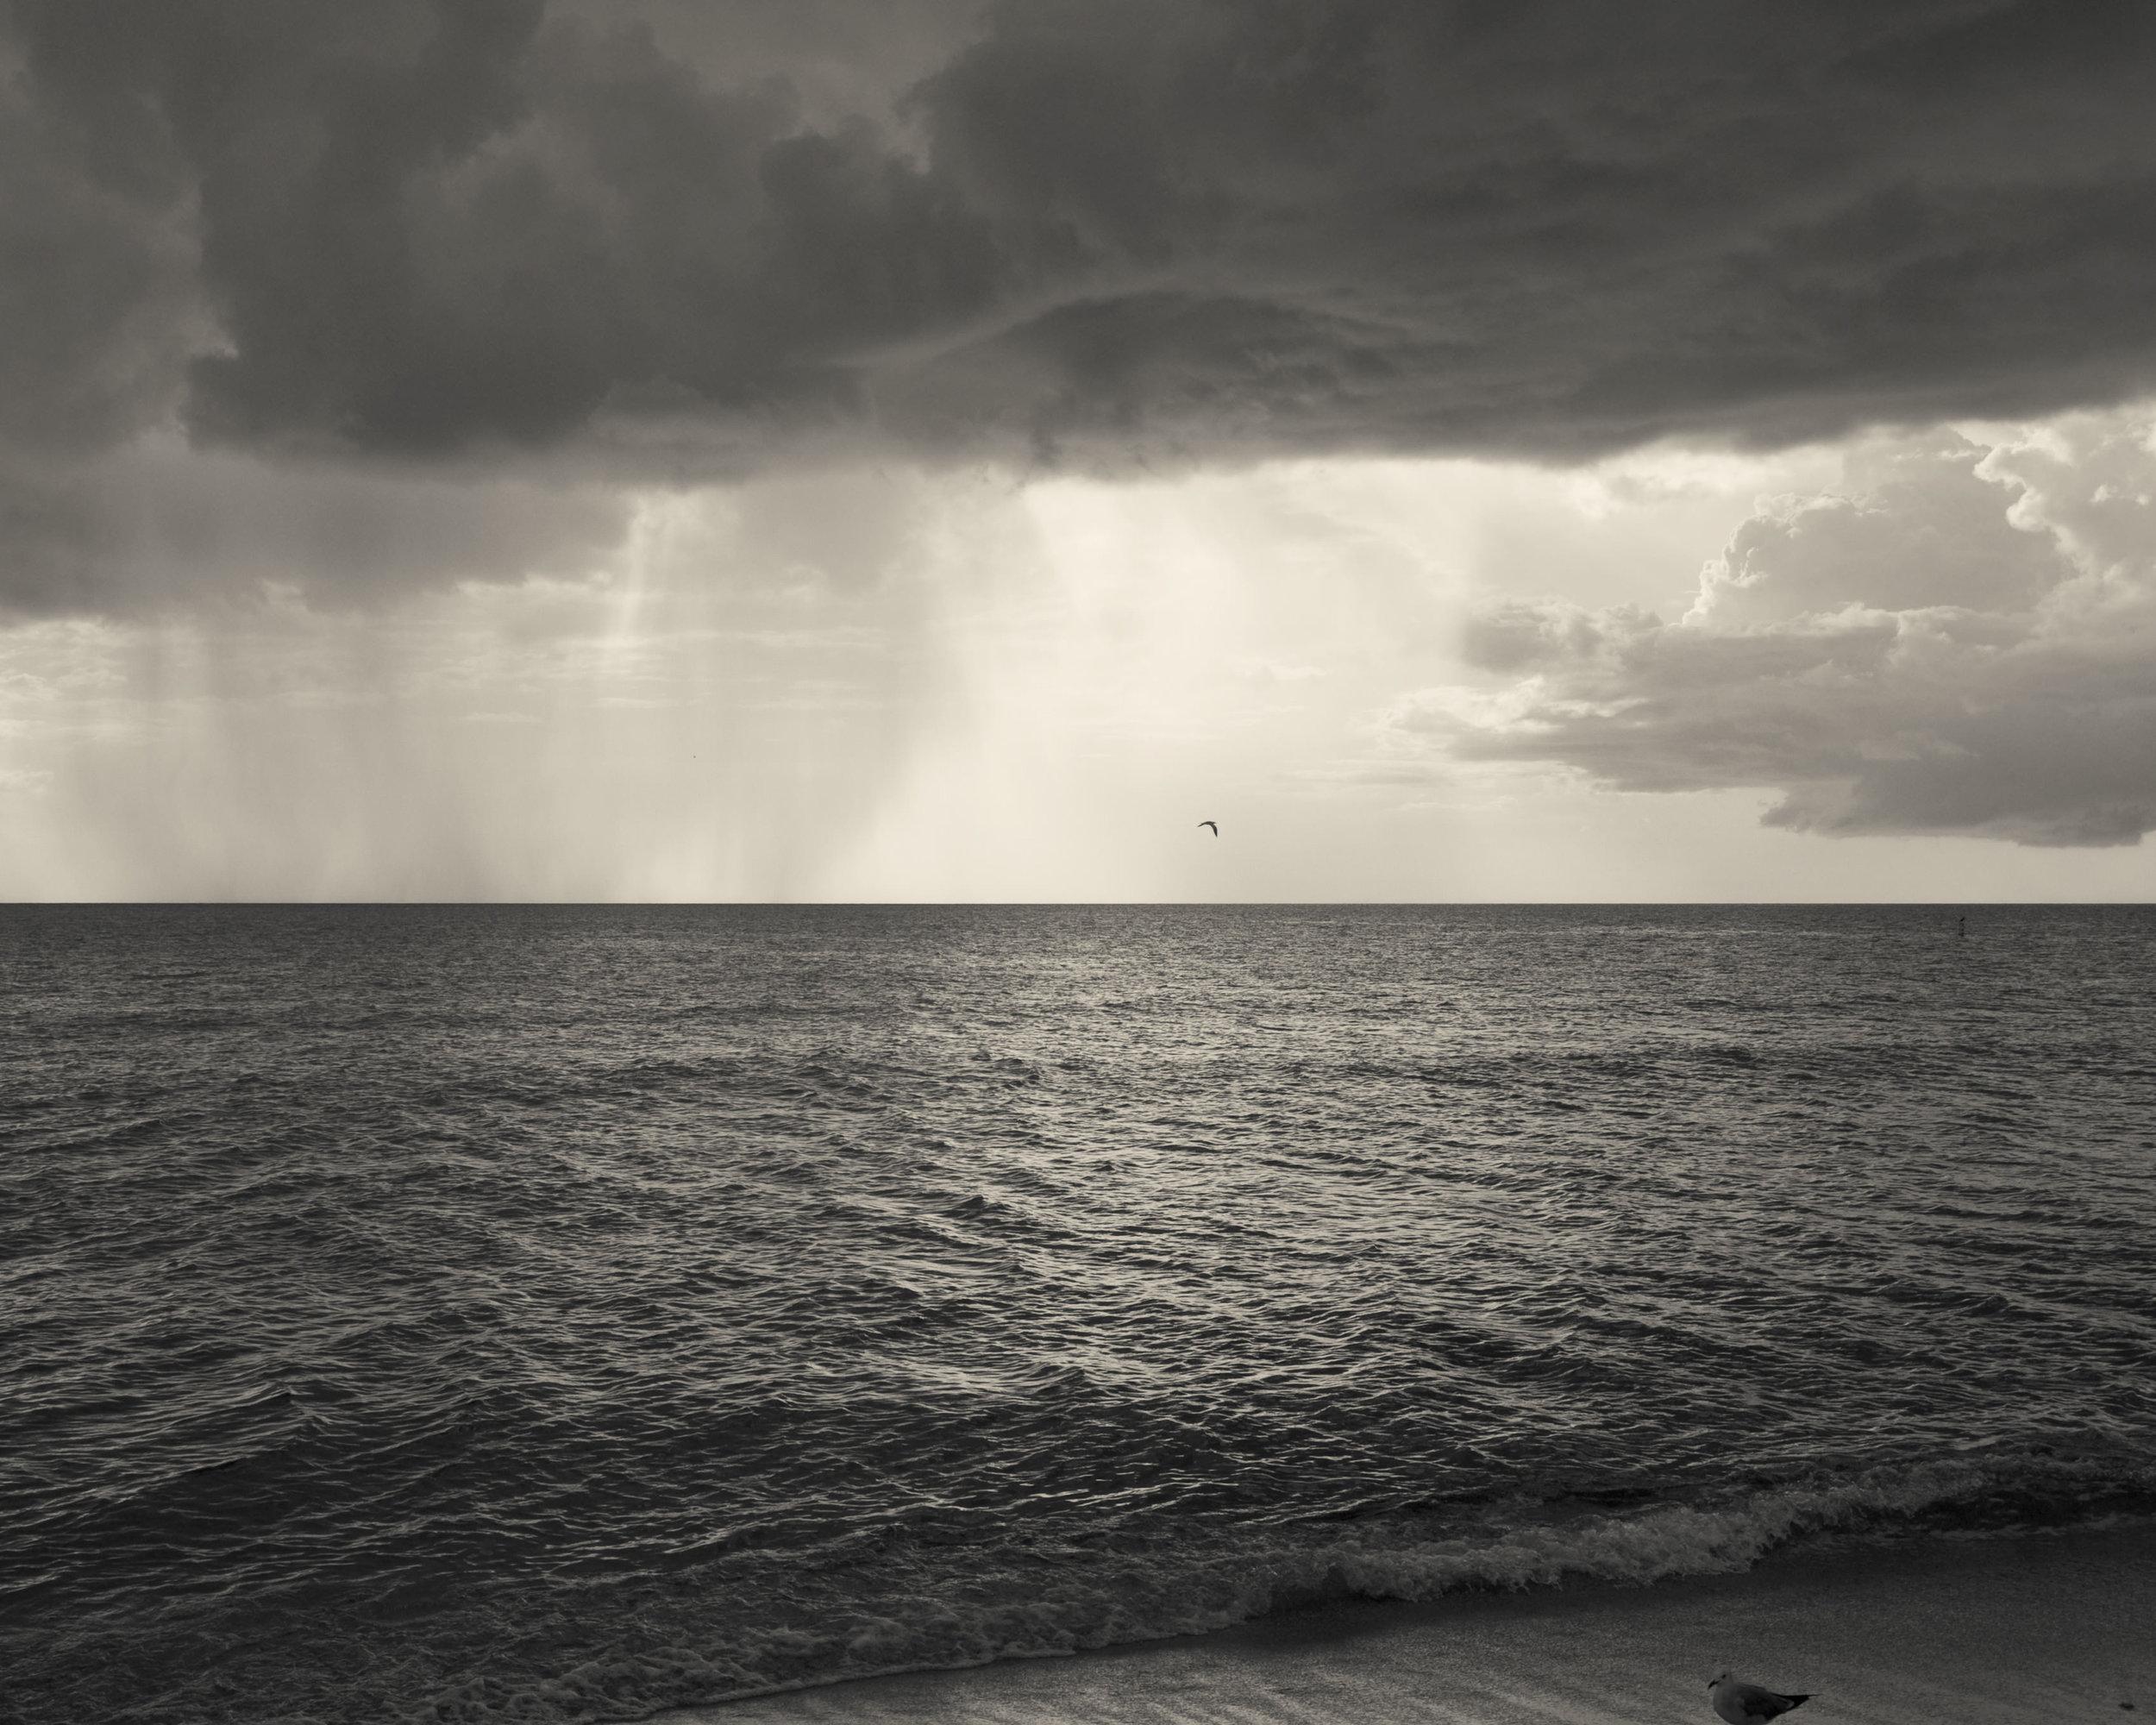 rain-8752-smugmug.jpg